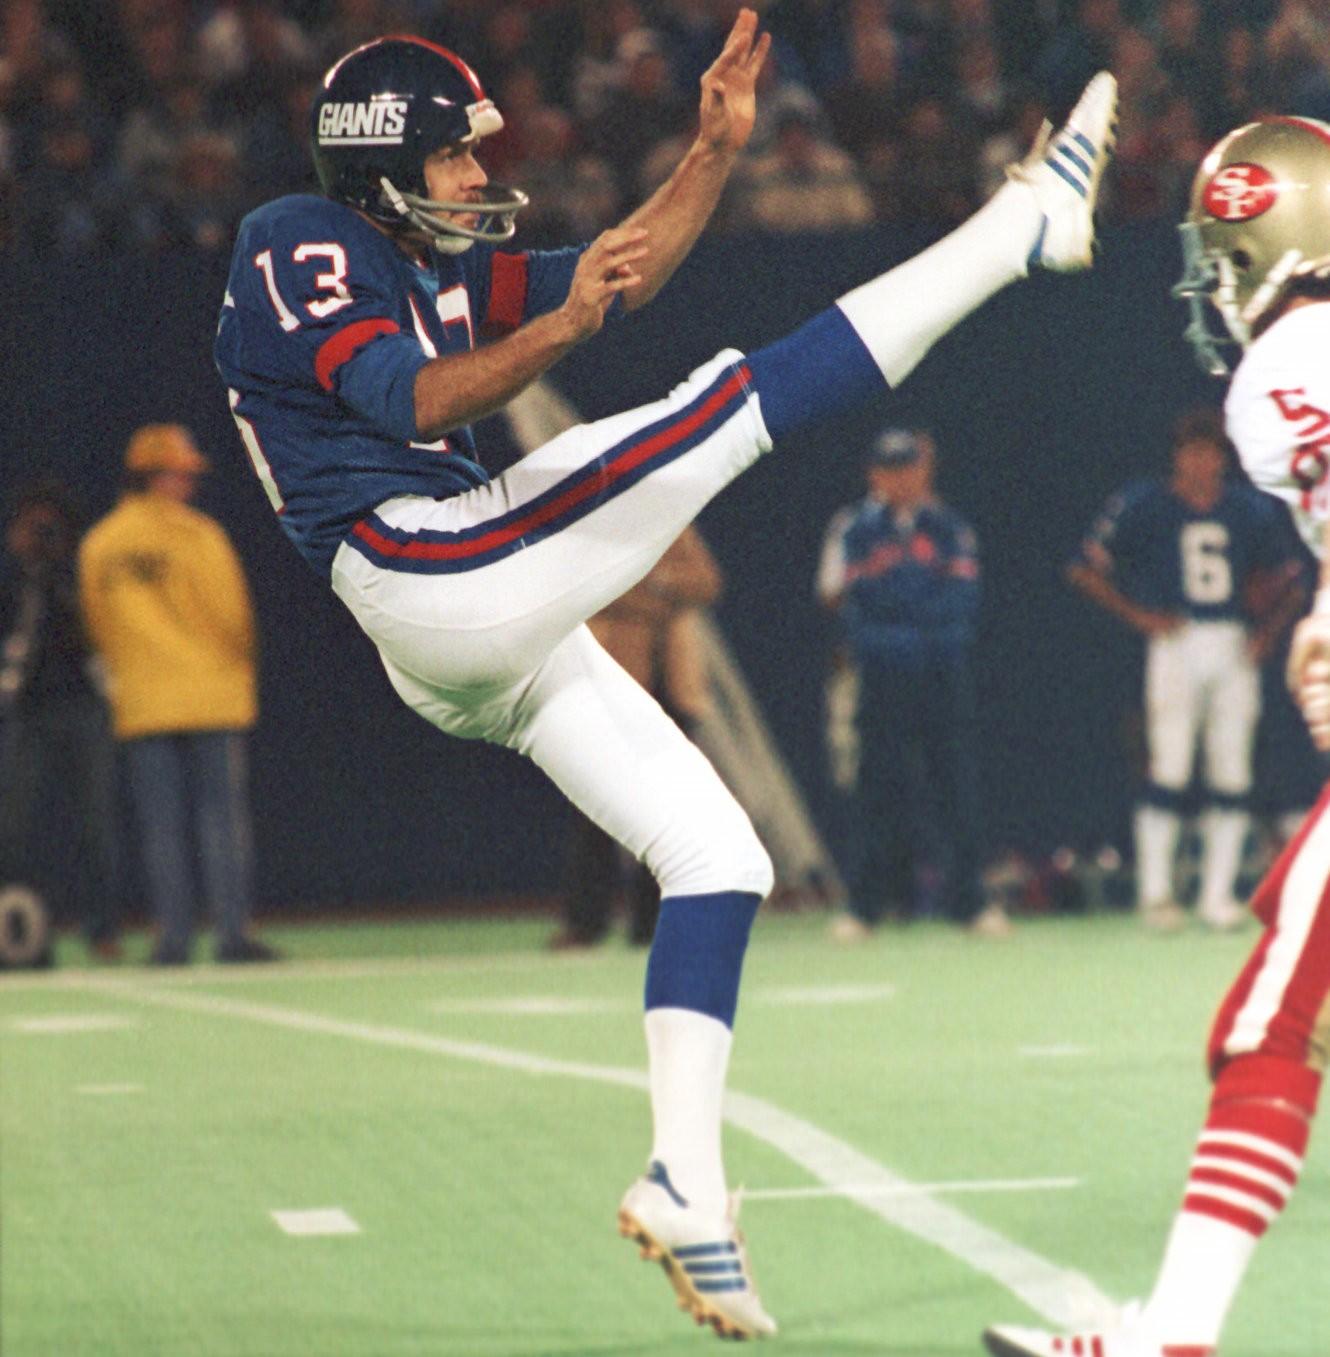 Dave Jennings, former punter for Giants and Jets, dies at 61 - nj.com